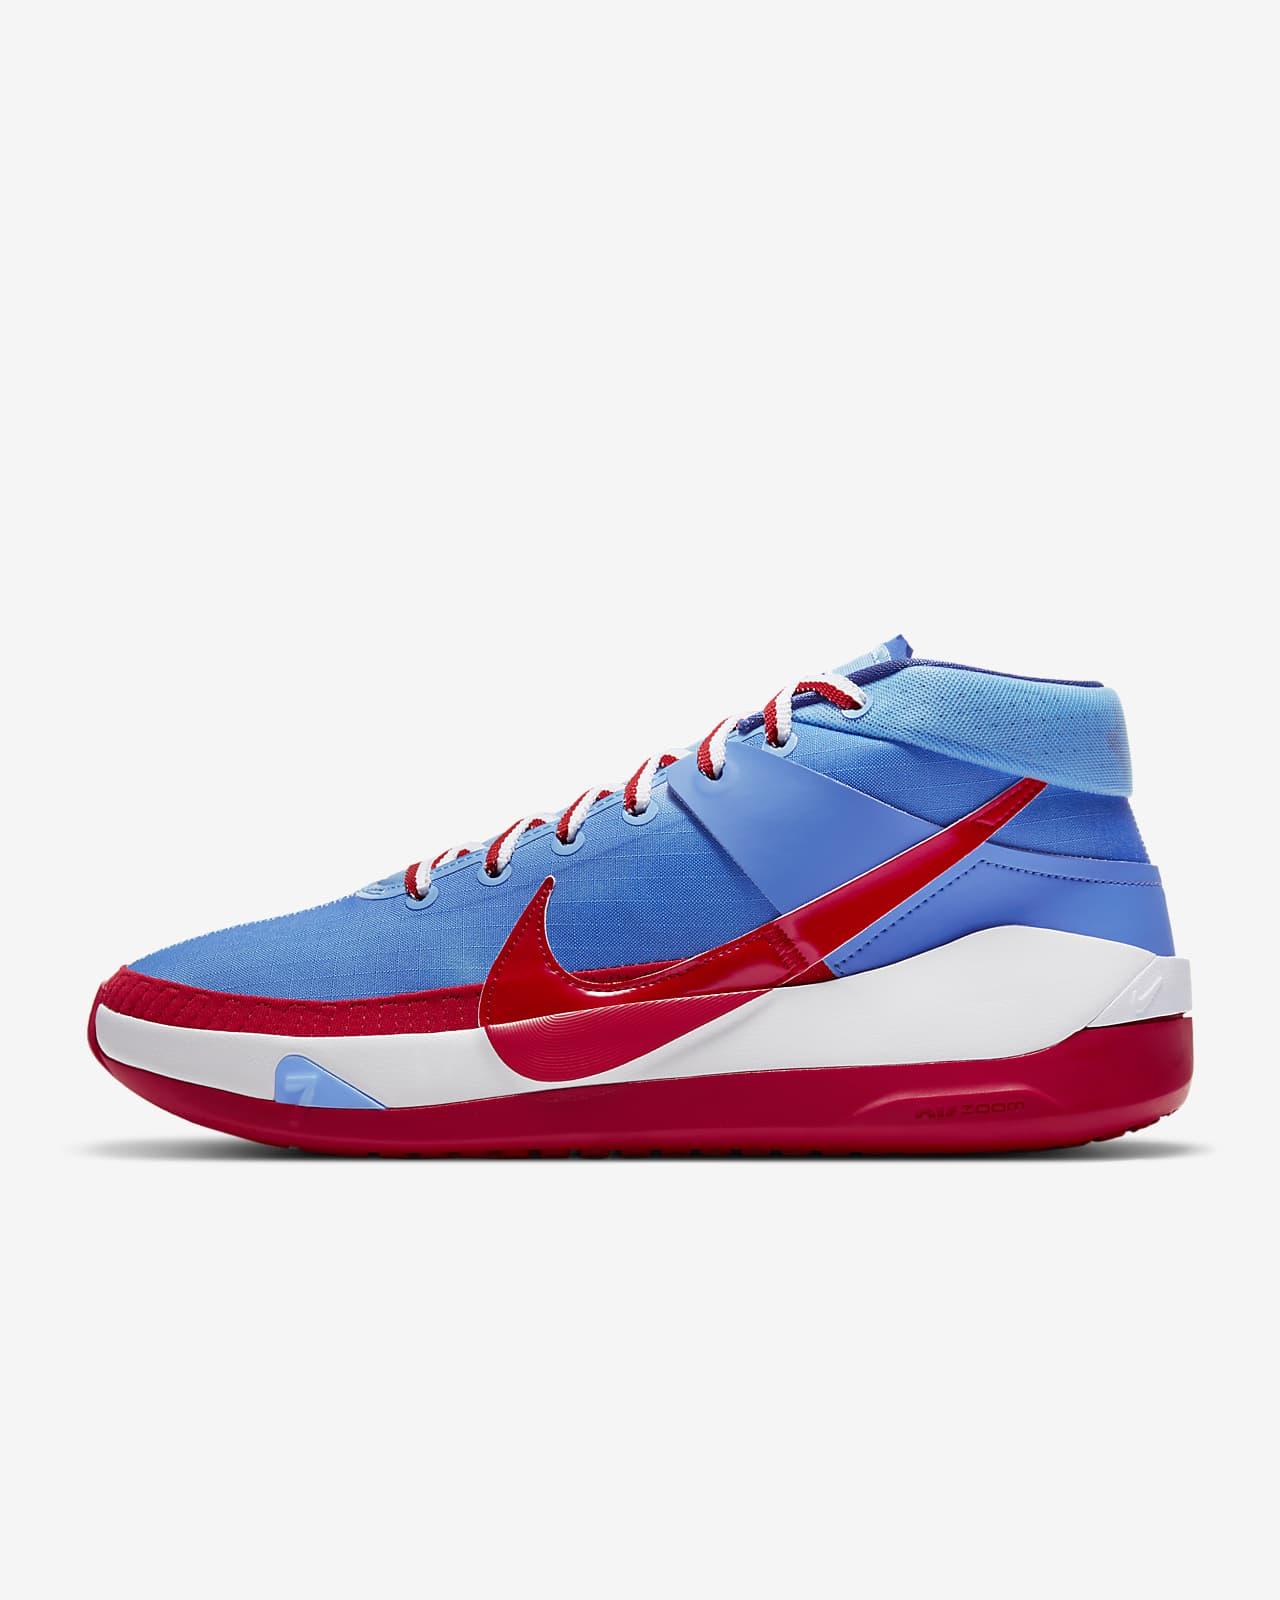 KD13 EP Basketball Shoe